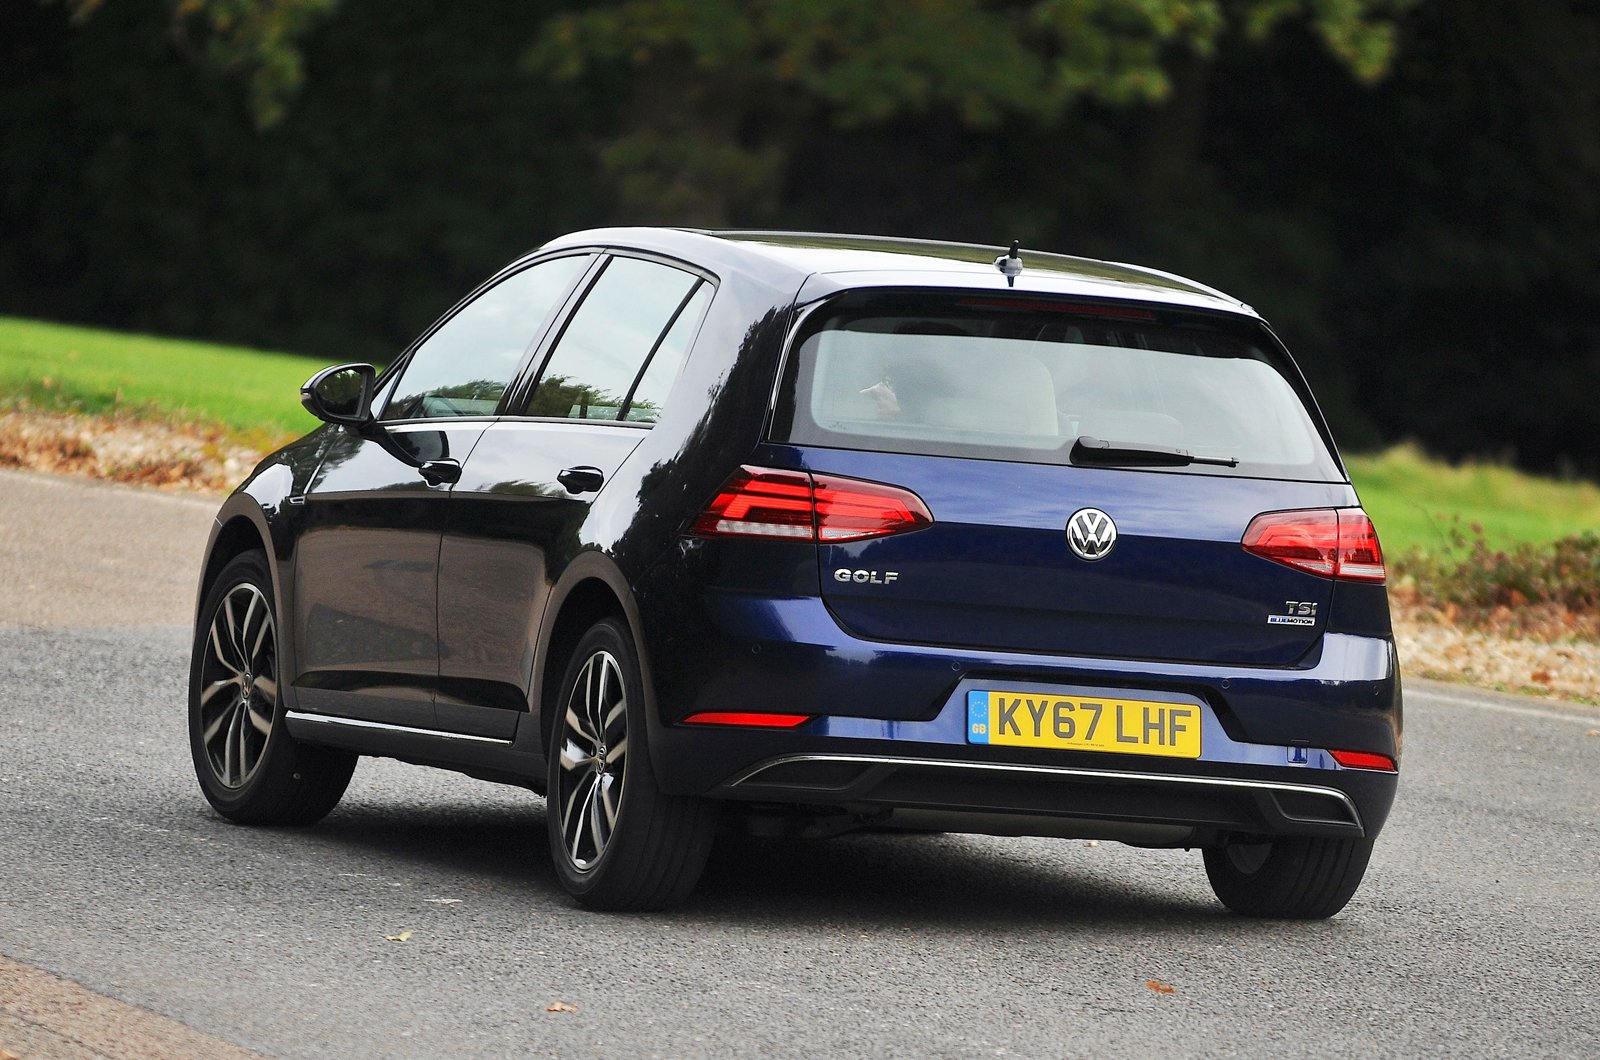 Volkswagen Golf rear - 67-plate car